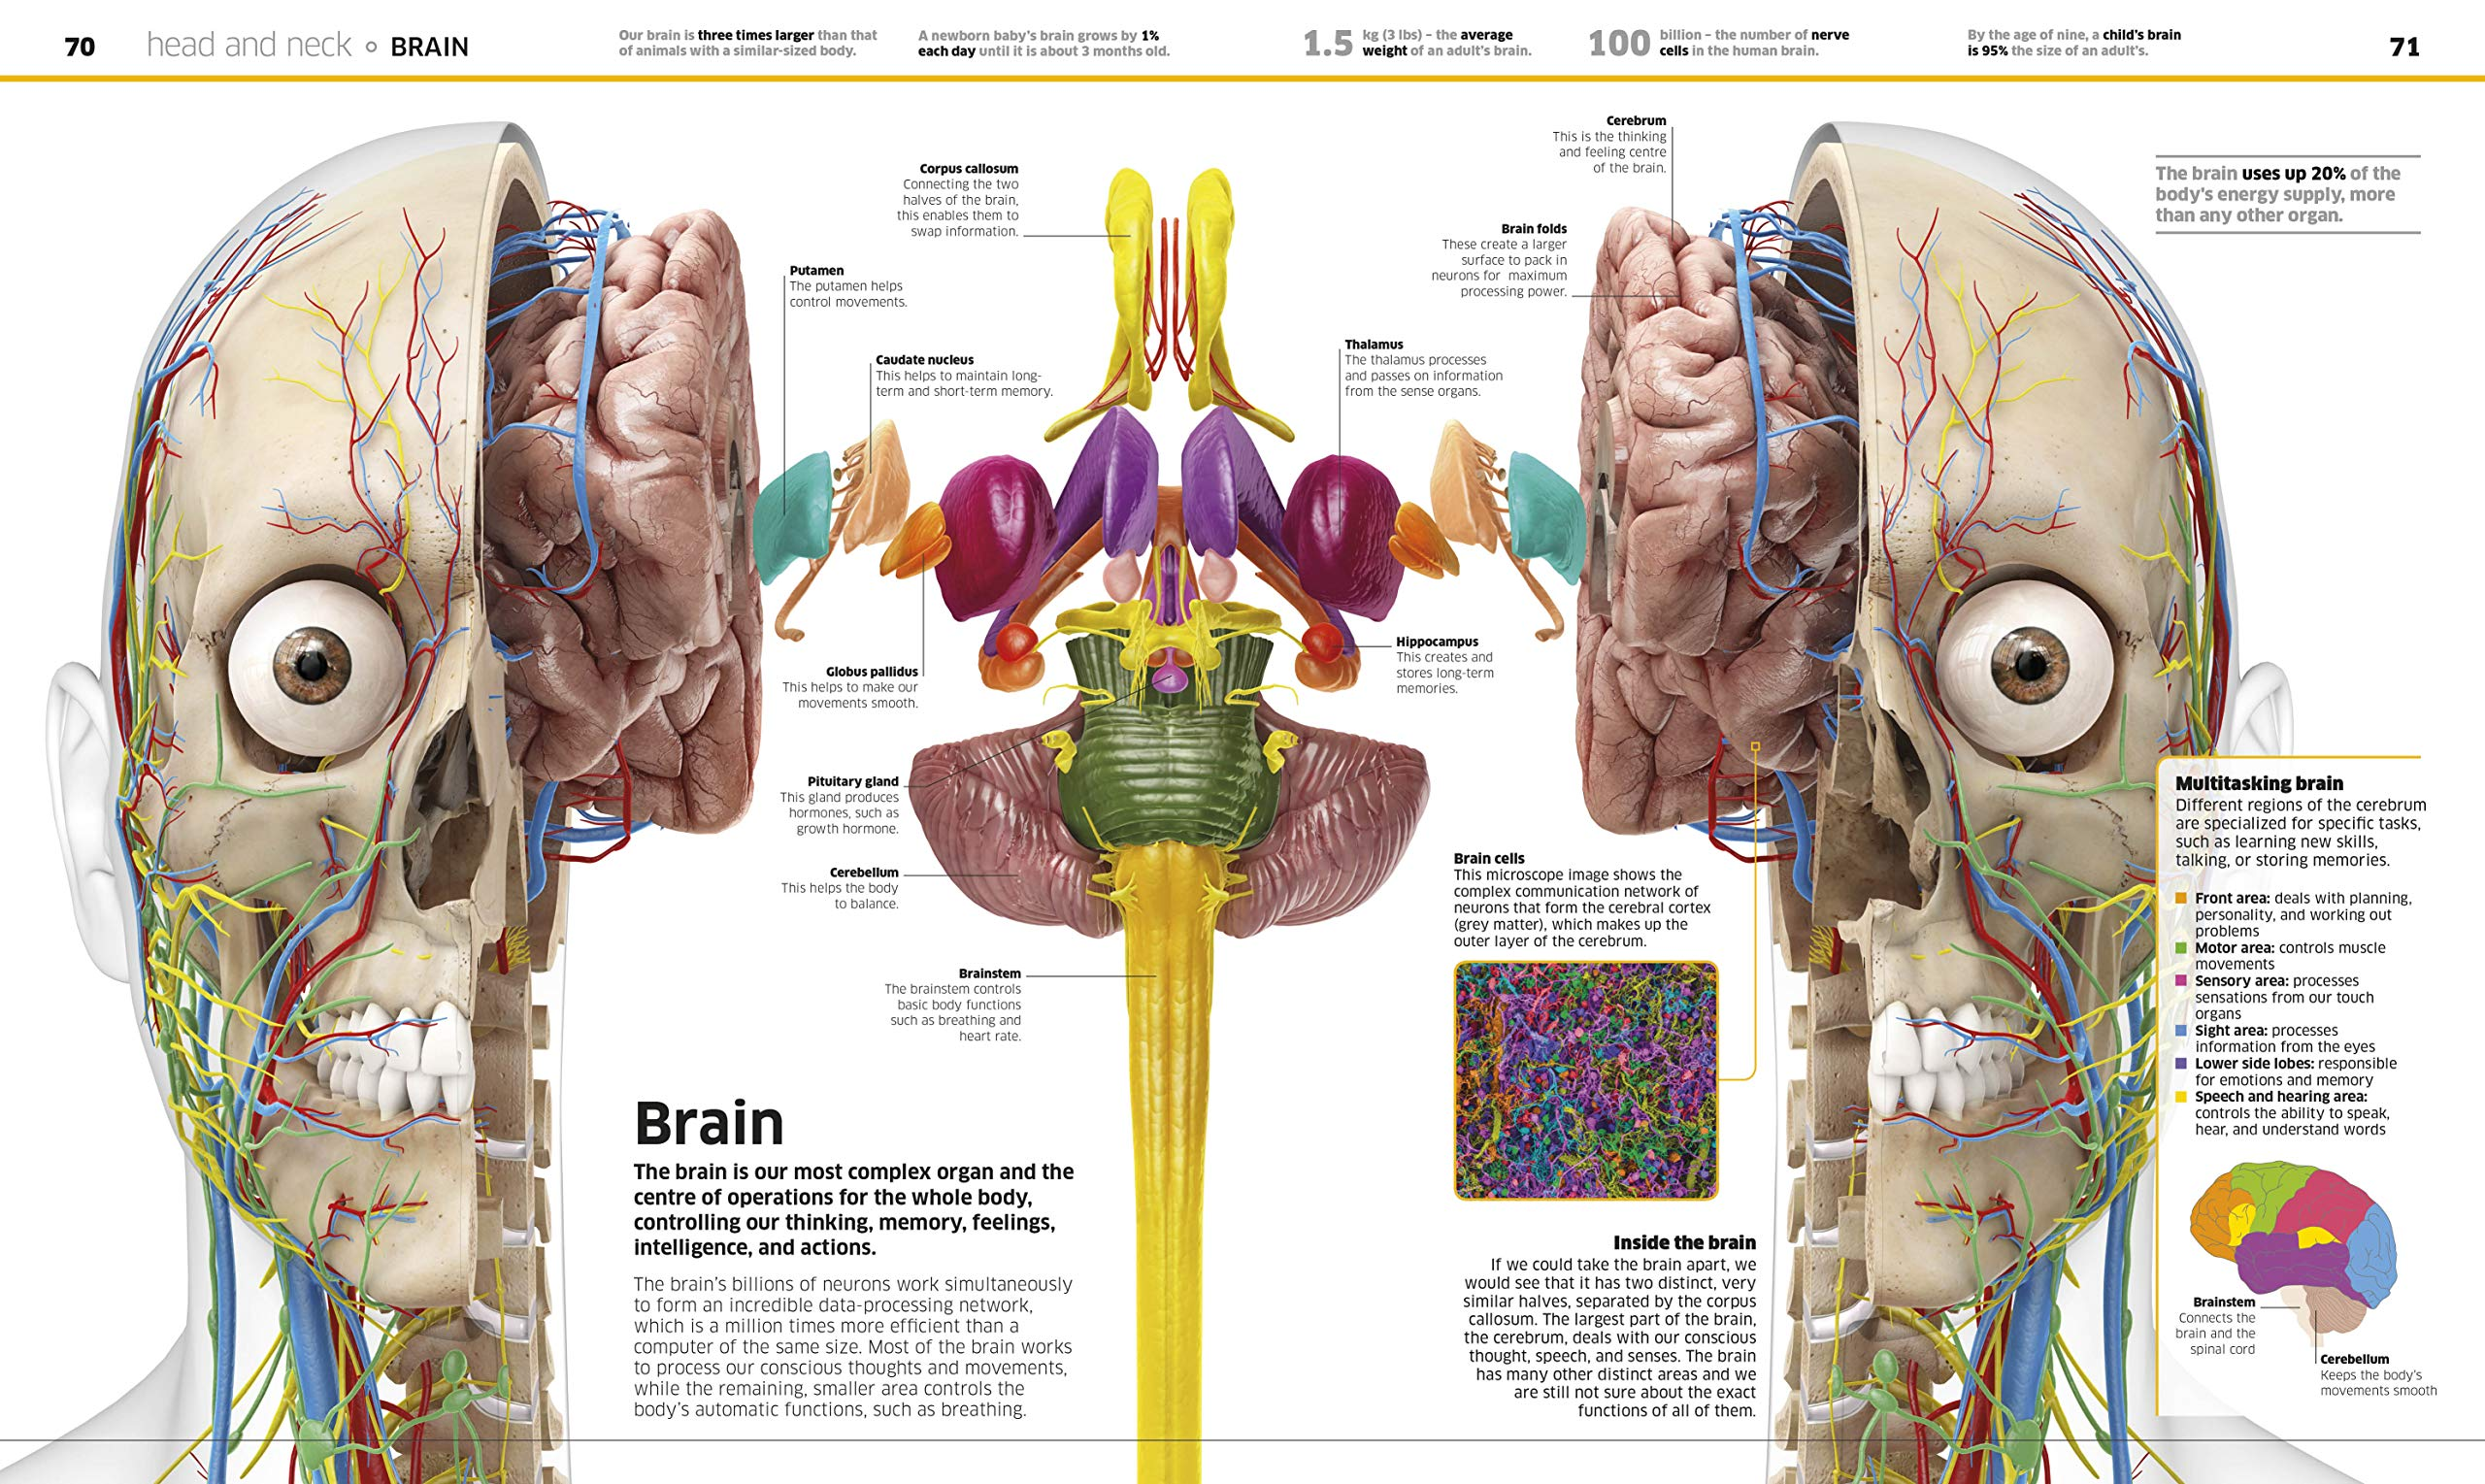 Knowledge Encyclopedia Human Body!: Amazon.es: Vv.Aa., Vv.Aa.: Libros en idiomas extranjeros